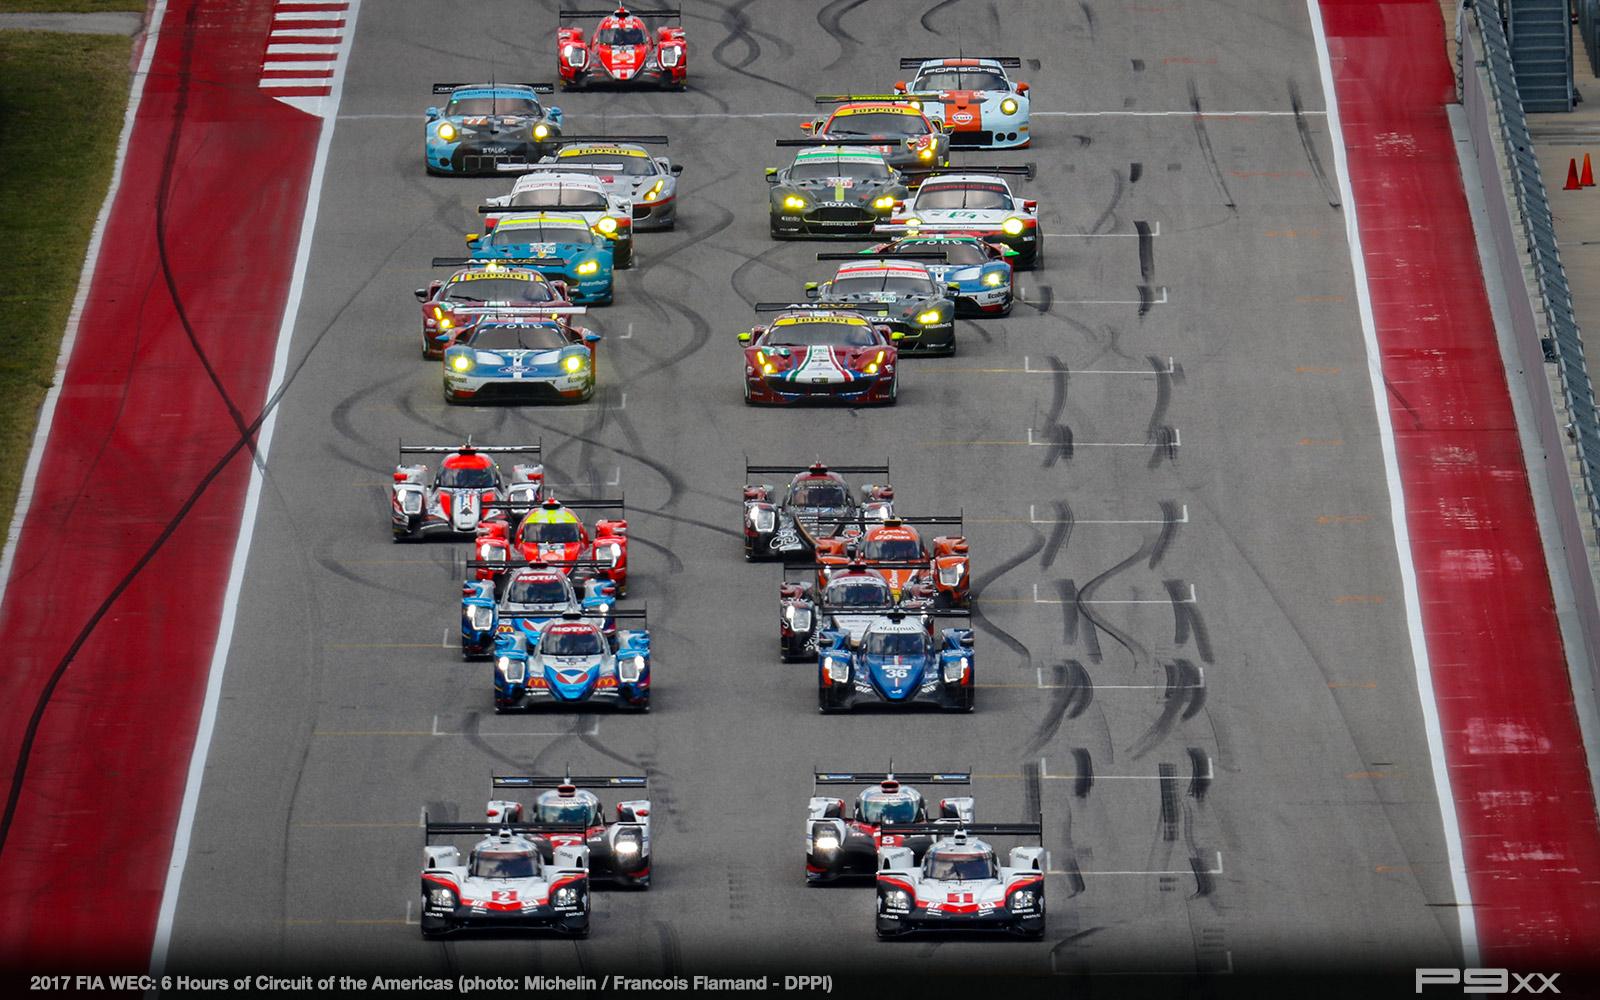 2017-FIA-WEC-6-HOURS-OF-COTA-PORSCHE-stin_02117009_12377301